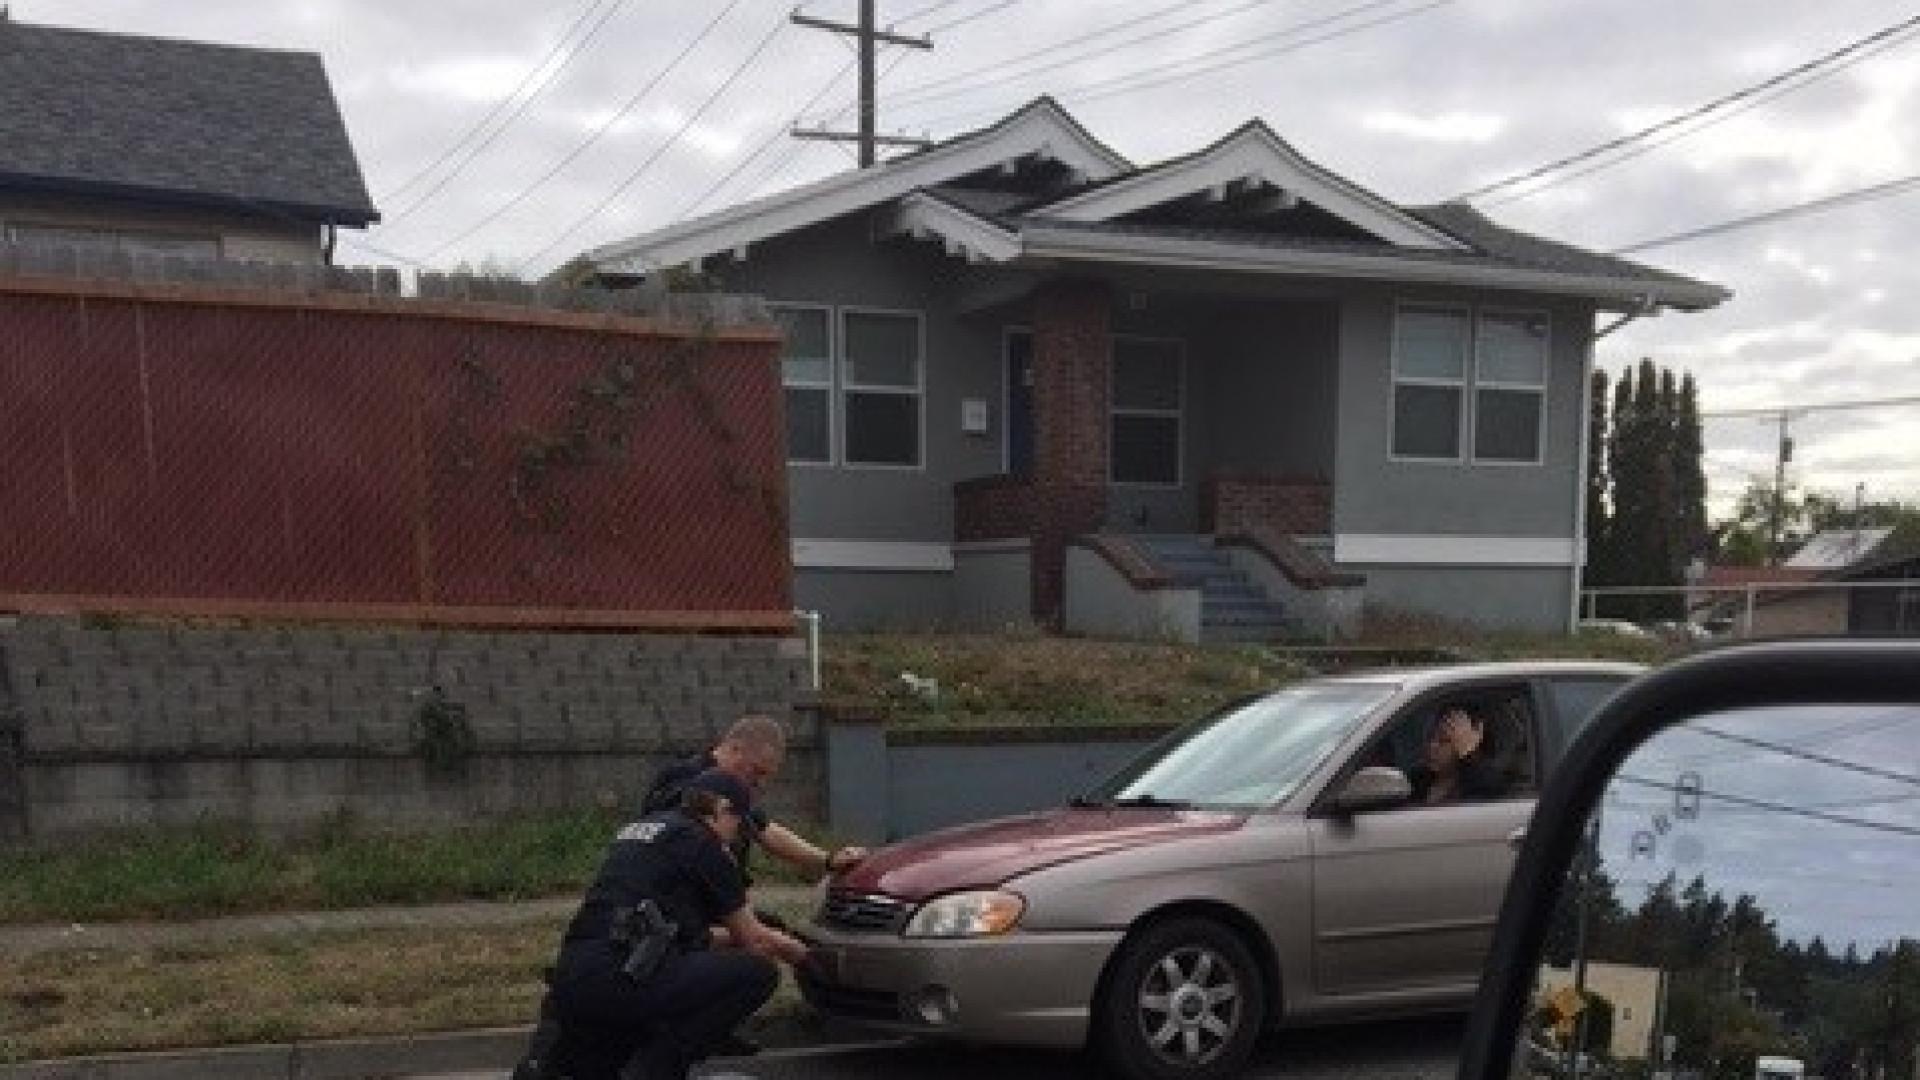 Polícia manda parar veterana naval. Ao invés de multa recebe presente